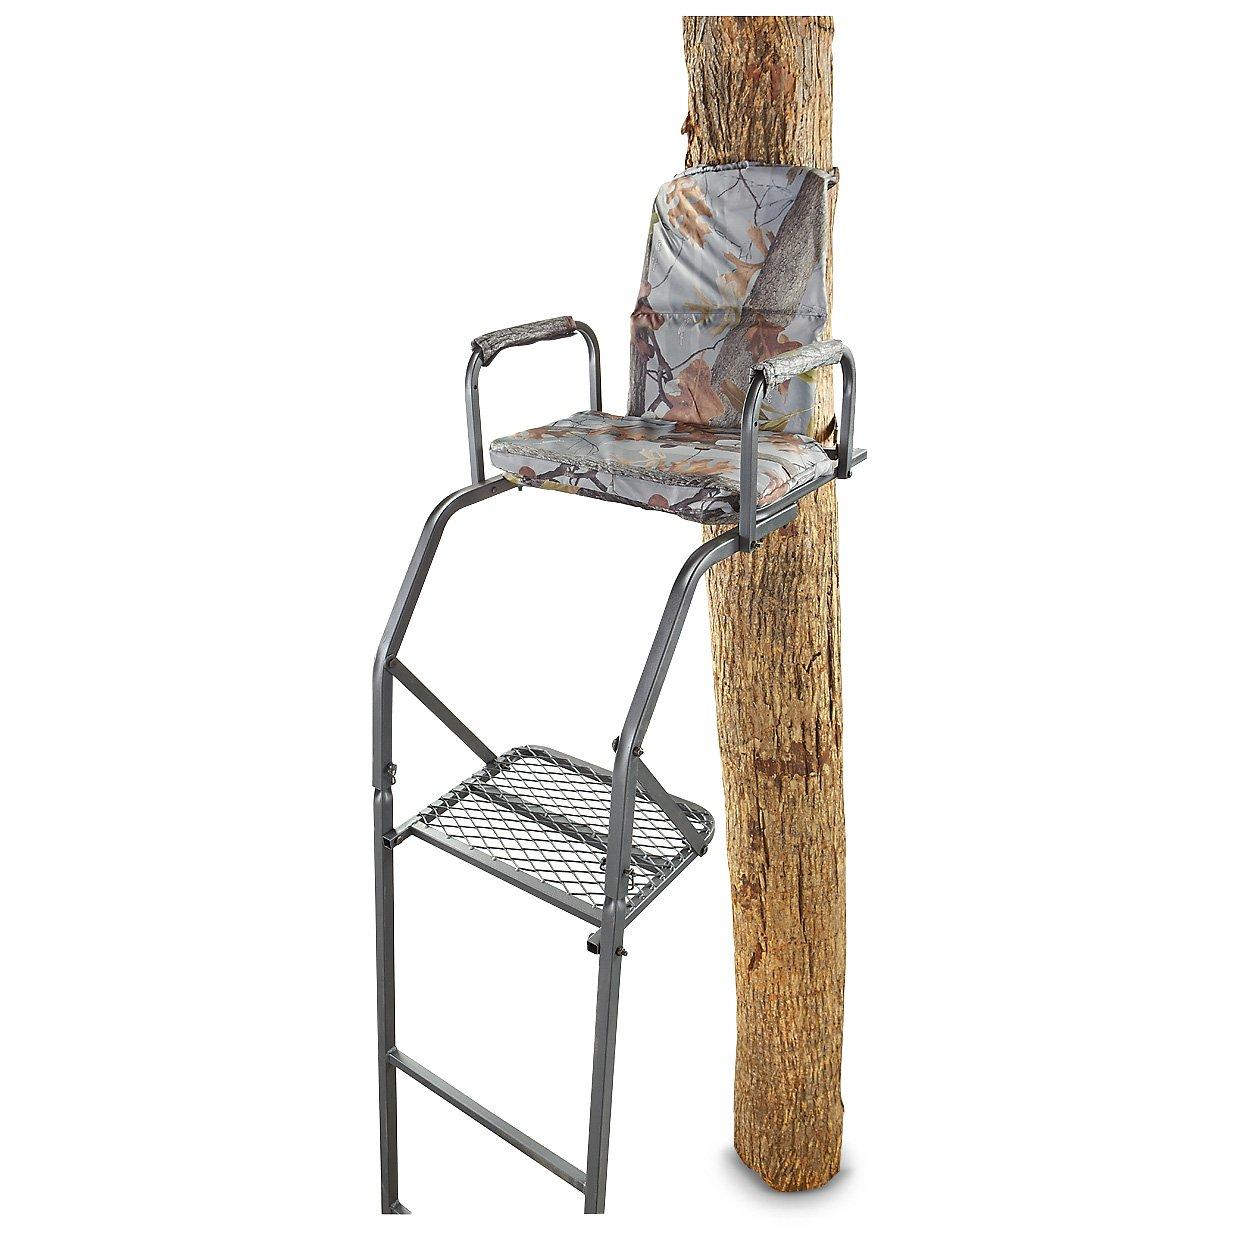 Tree stand guide gear 16 39 ladder treestands hunting for Ladder deer stands